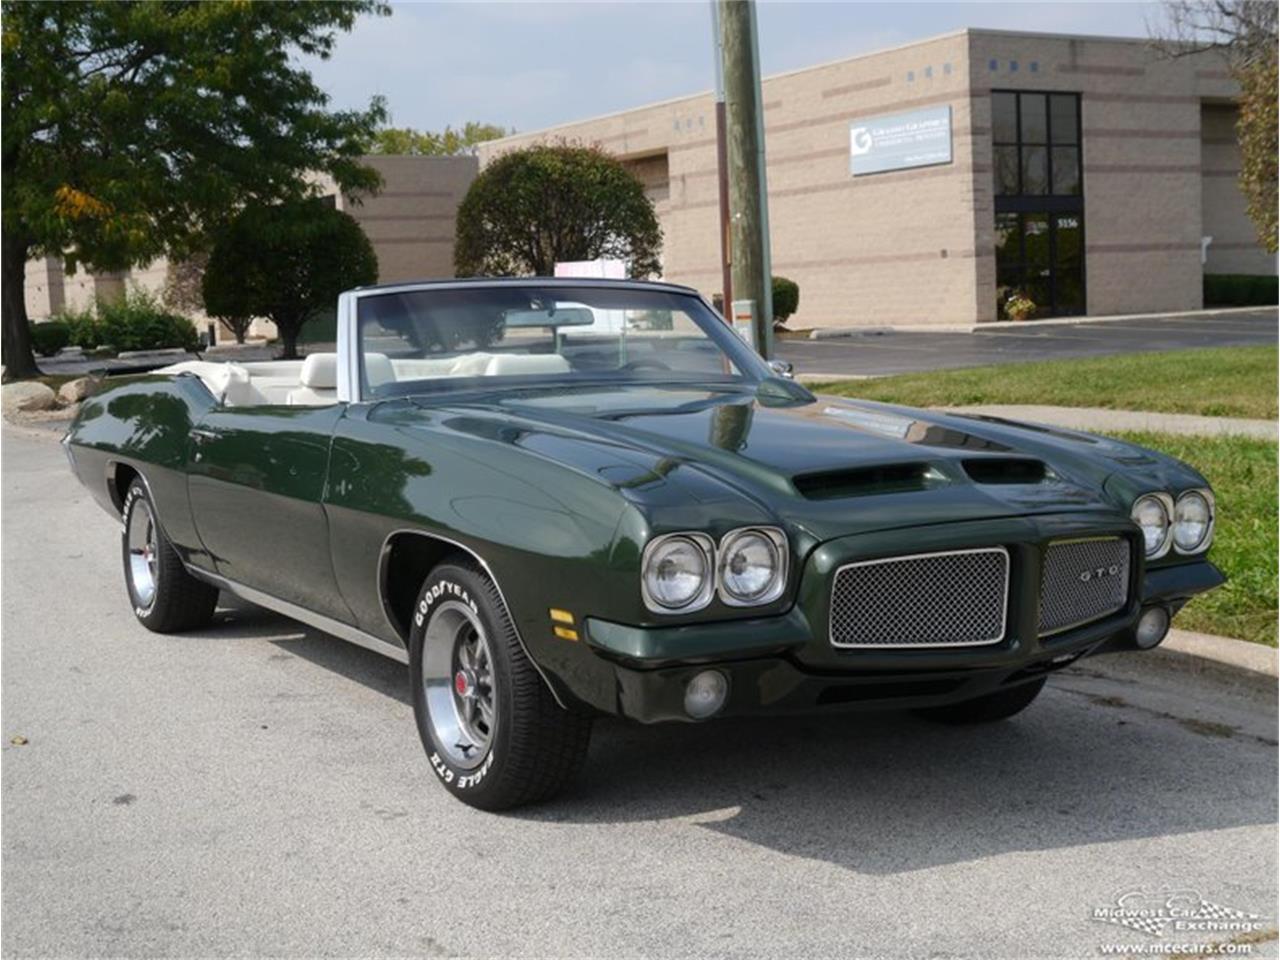 Large Picture of Classic '71 GTO located in Alsip Illinois - $66,900.00 - QAXE